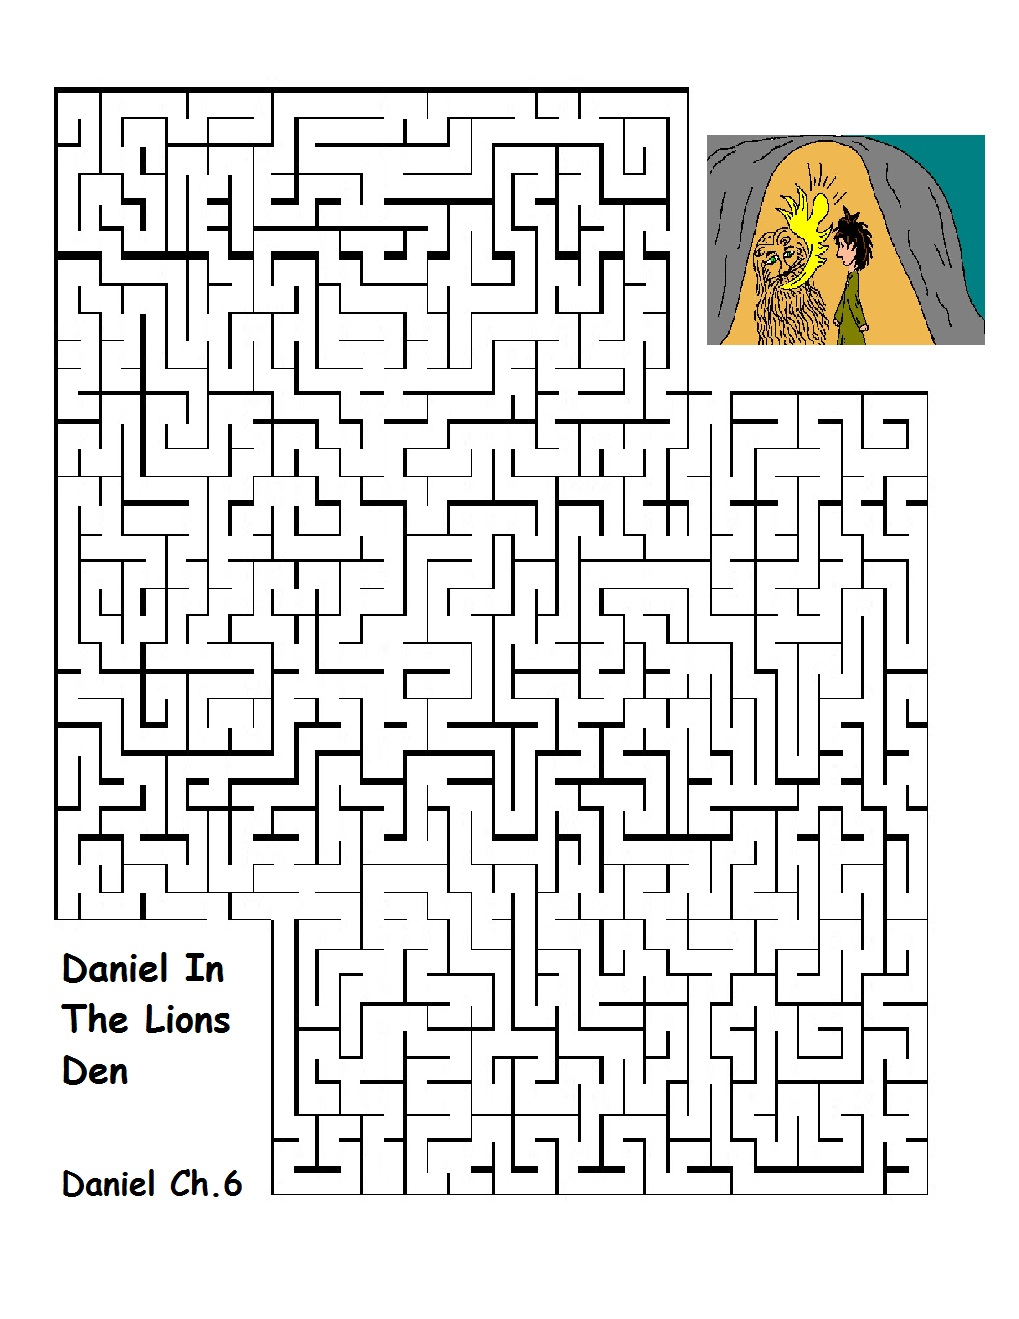 Daniel In The Lion's Den Sunday School Lesson